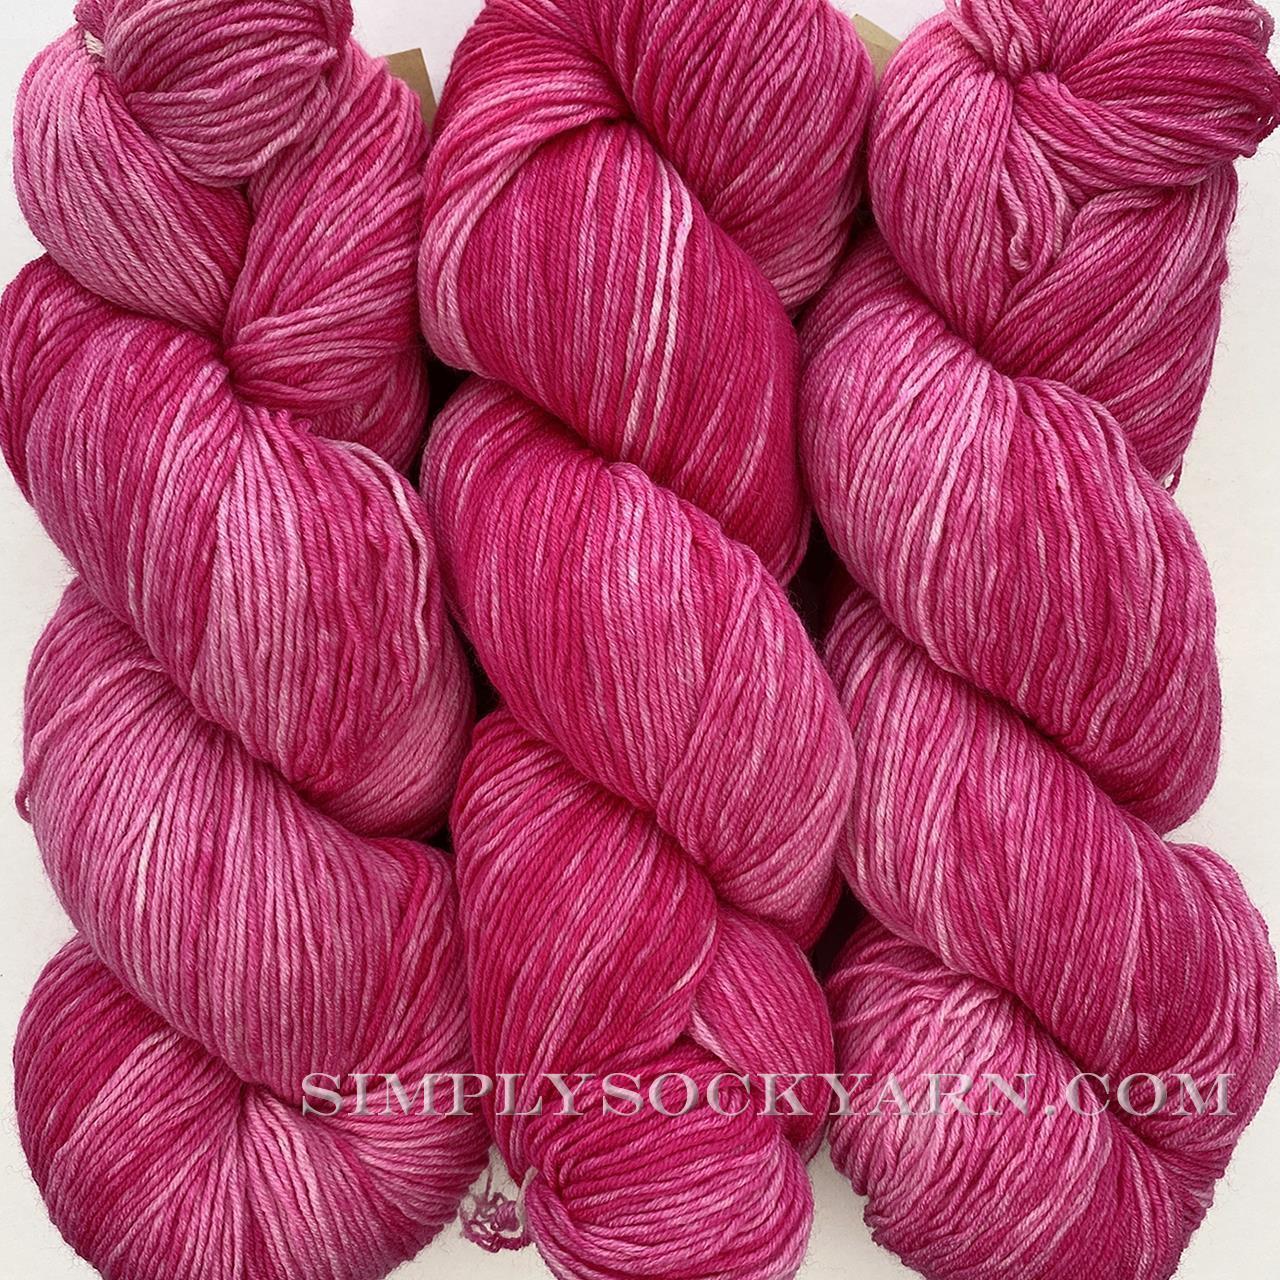 Urth Monochrome 3066 Hot Pink -